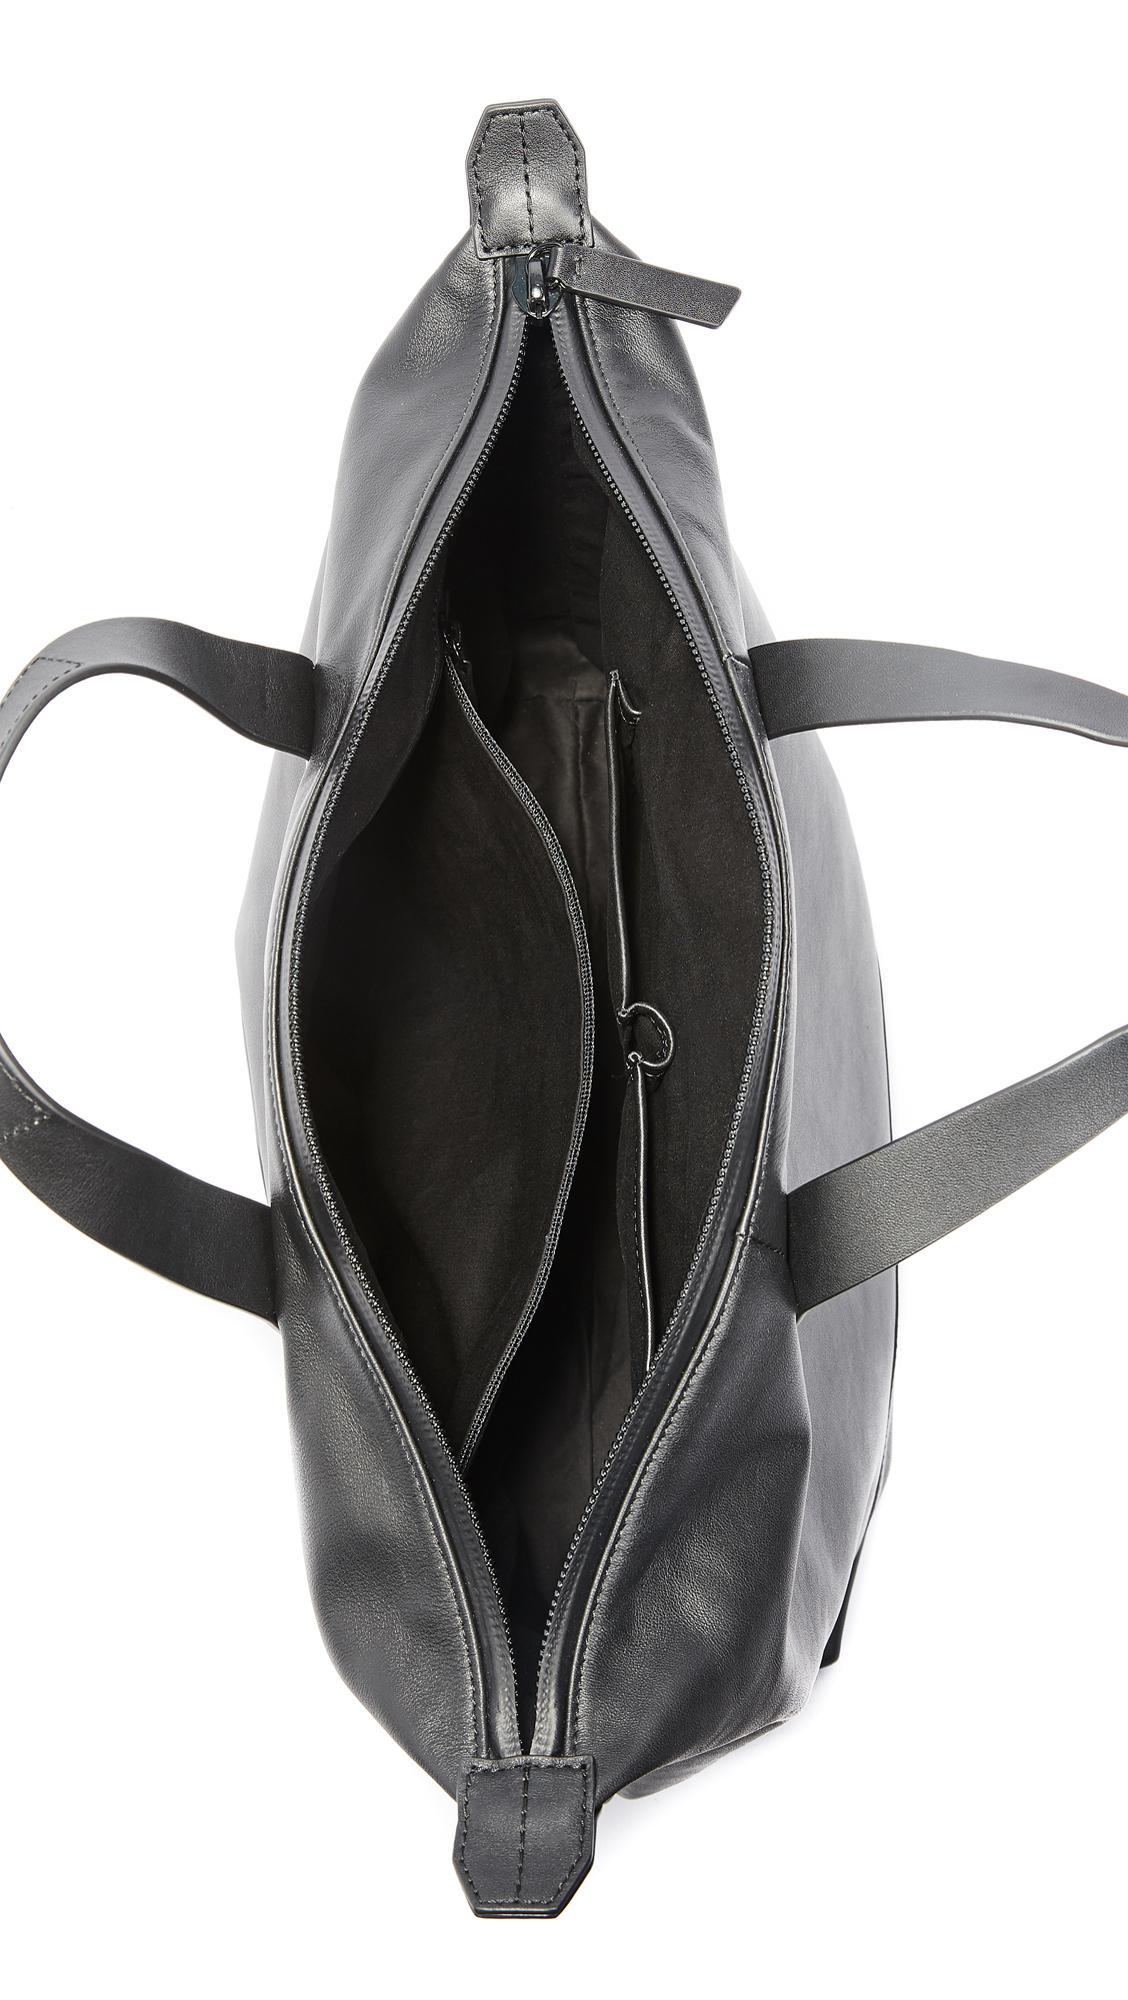 Uri Minkoff Leather Chelsea Double Zip Tote in Black for Men